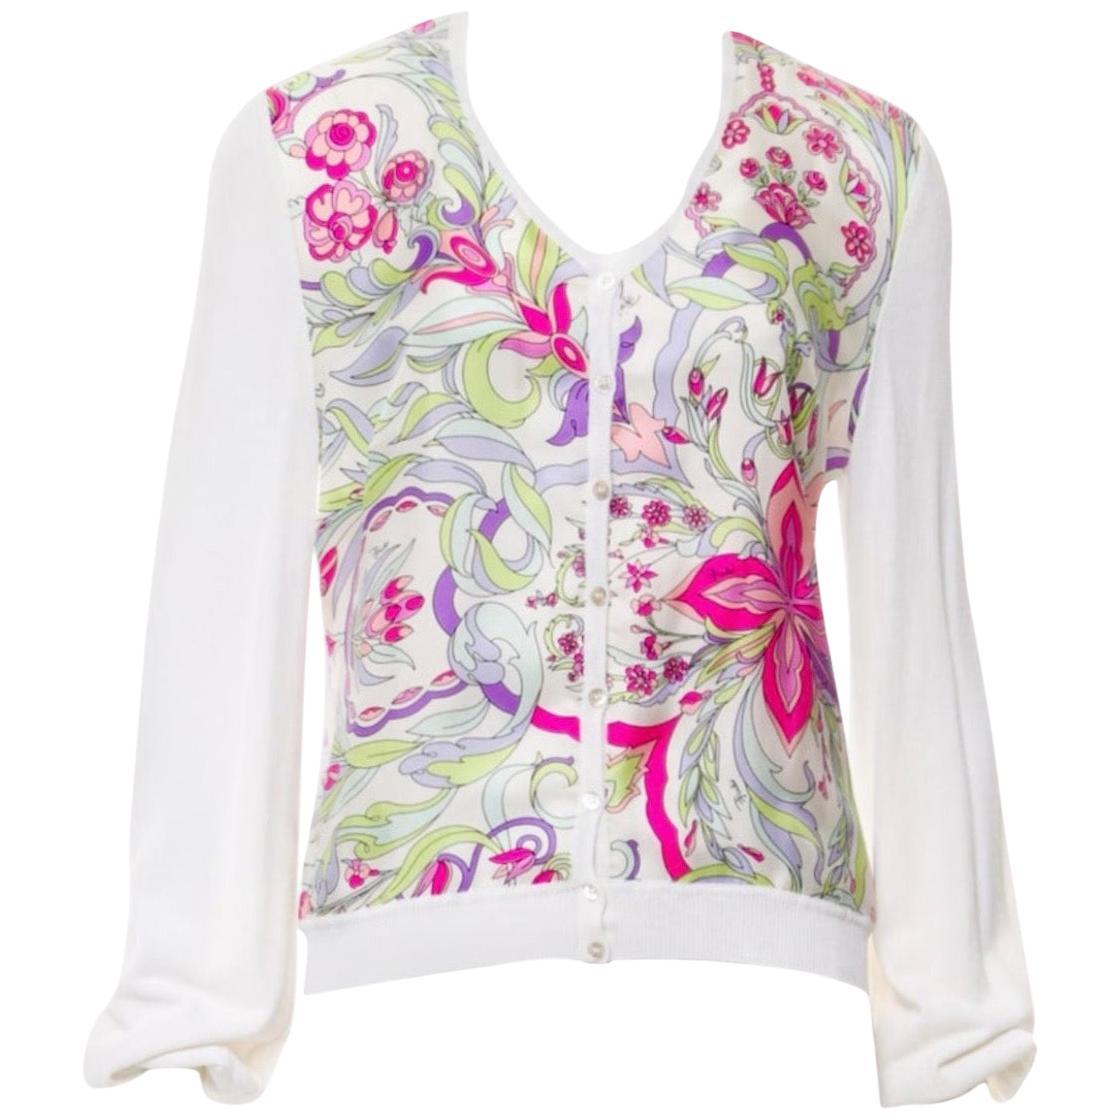 NEW Emilio Pucci Knit & Printed Silk Cardigan Jacket